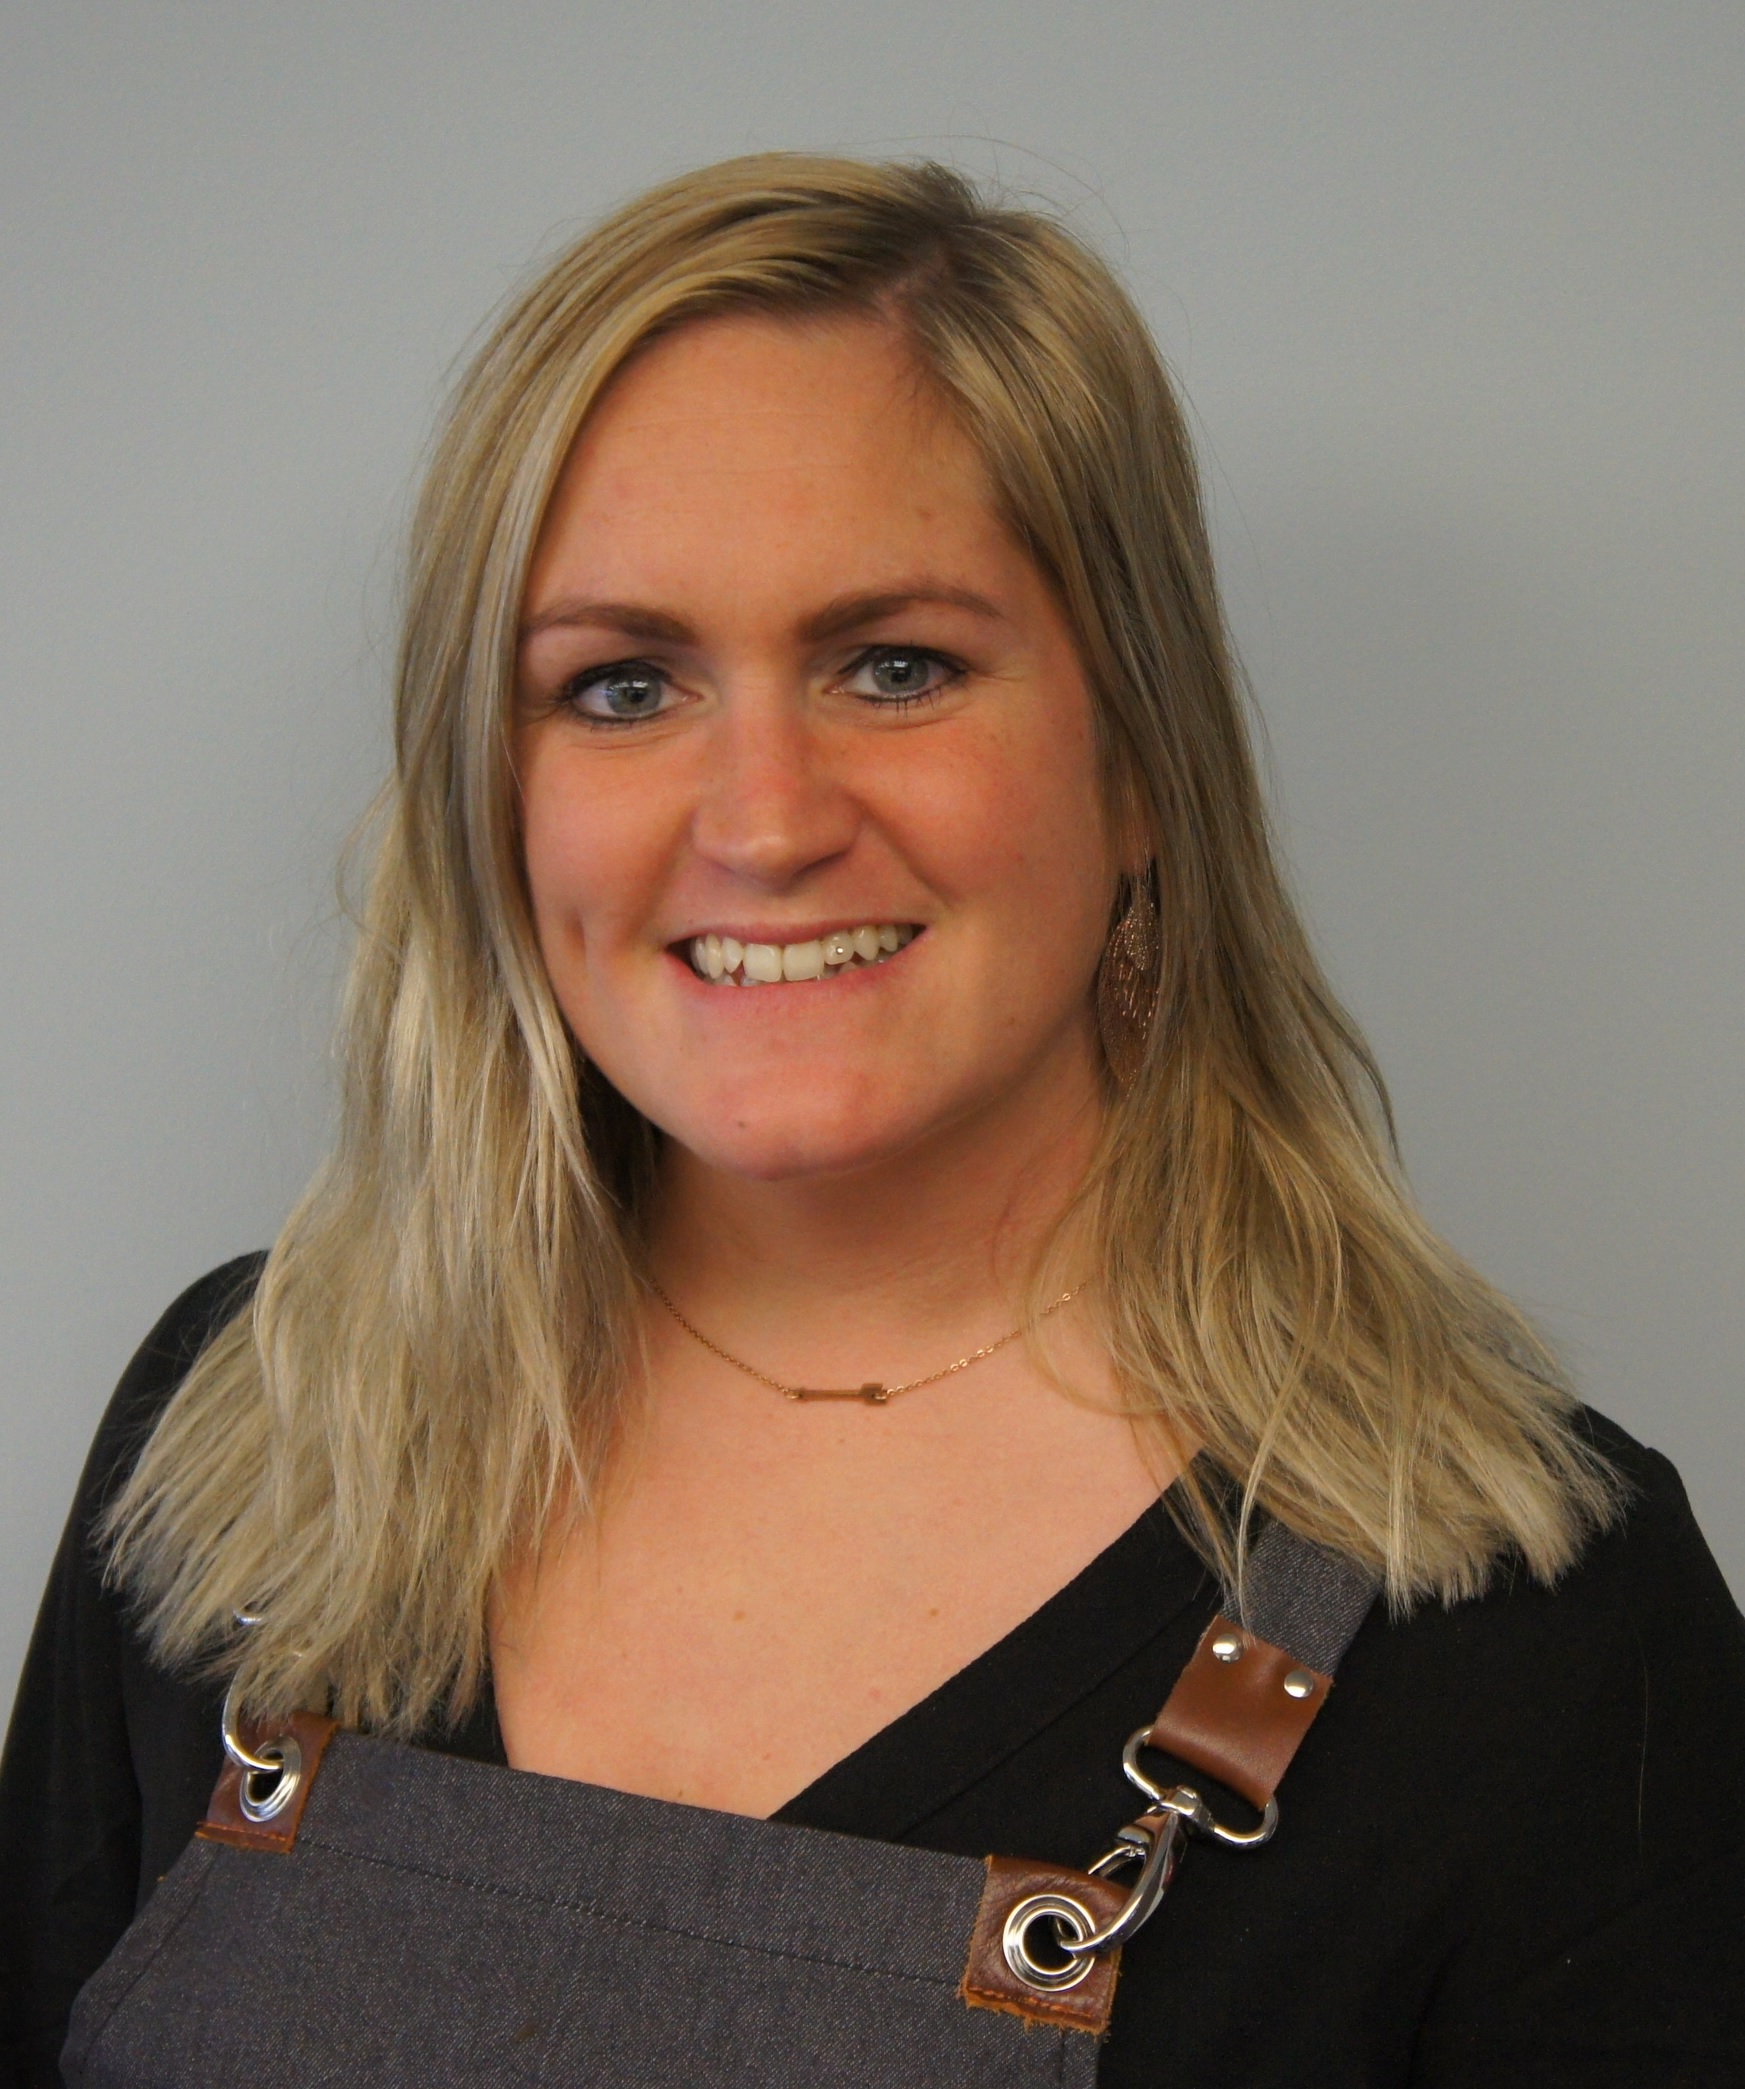 Deborah - Kapper bij Nandas Hairfashion Elst (G)